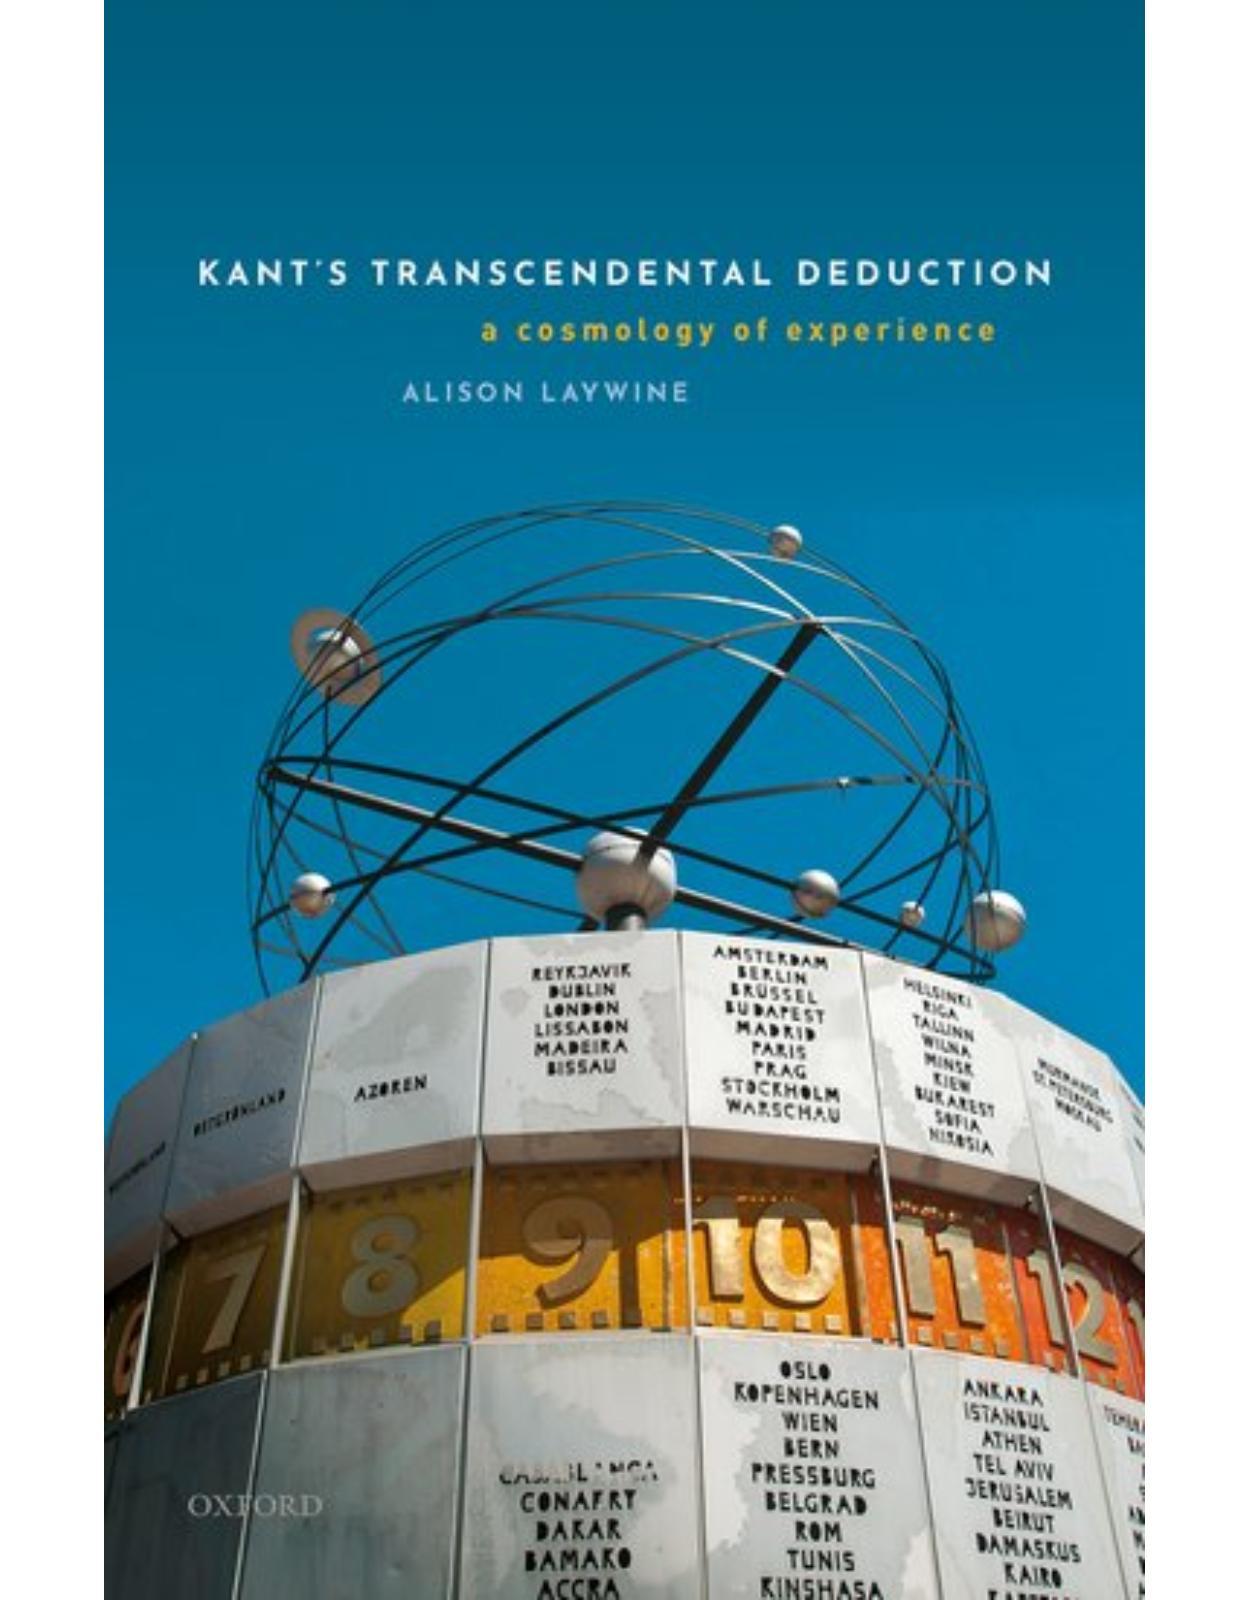 Kant's Transcendental Deduction